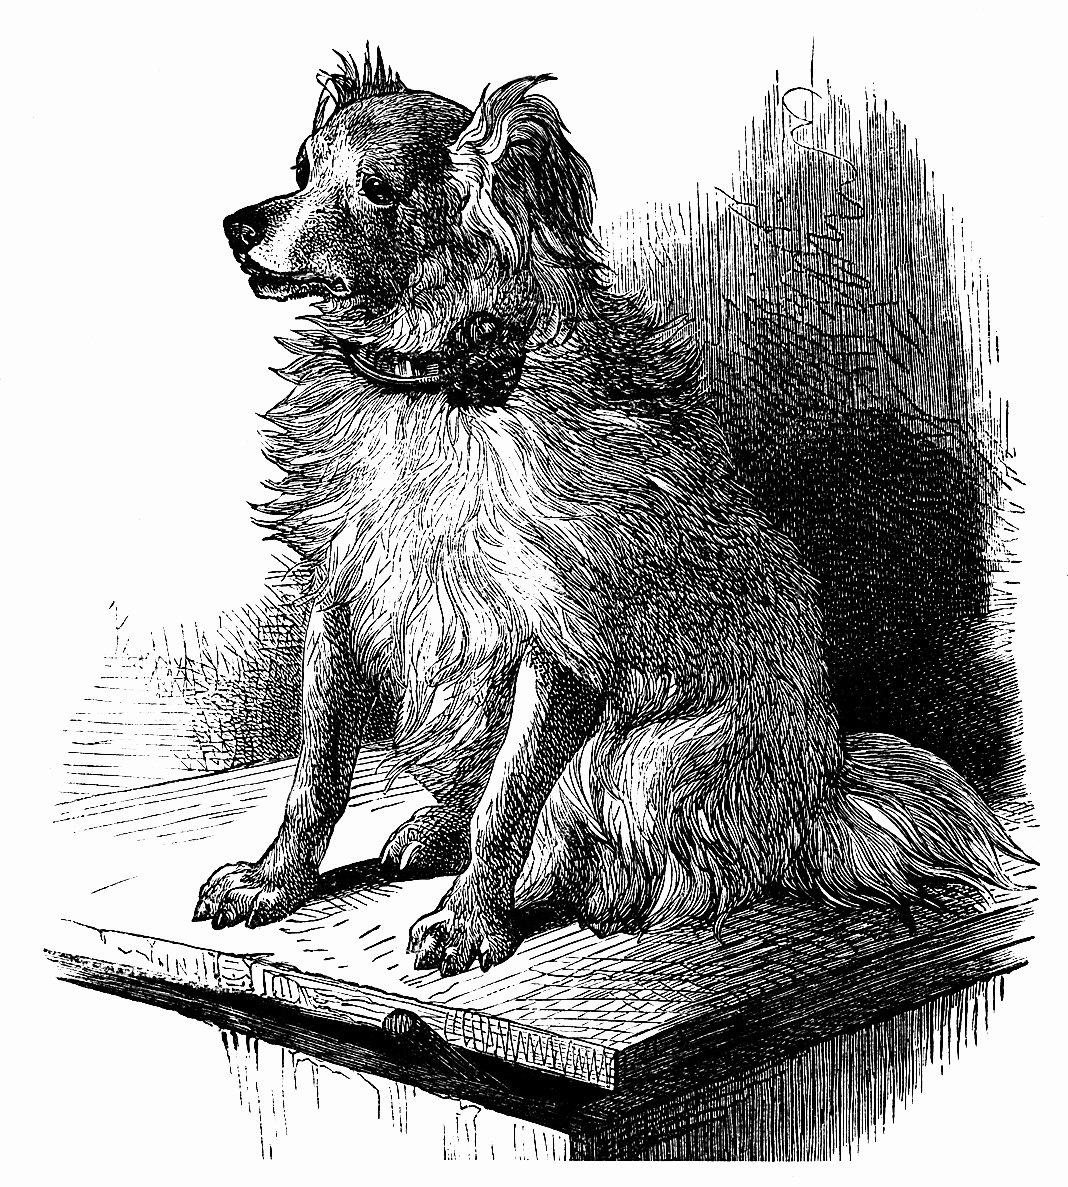 Black and White Illustration New Gordon Setter Dog Engraving Old Design Shop Blog